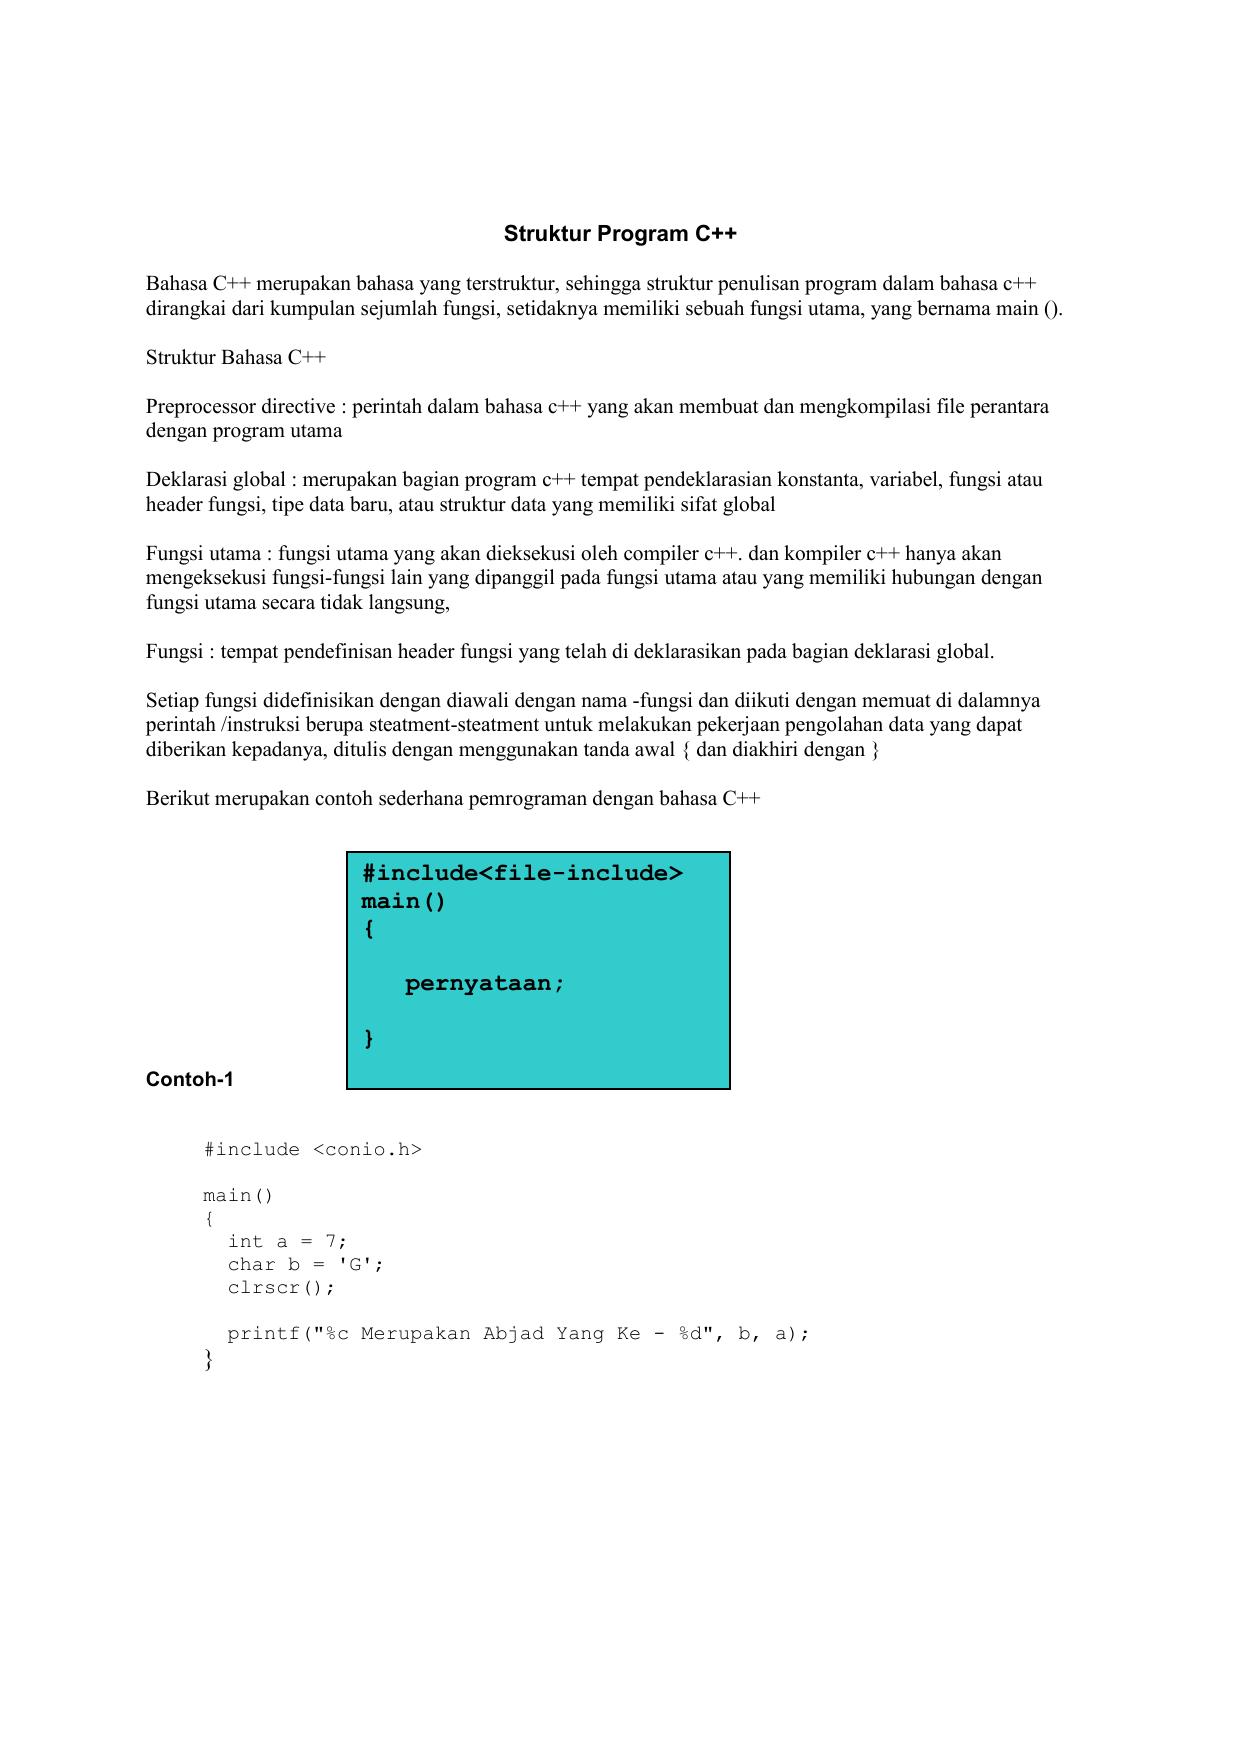 000686150 1 91e48f0070a5d80449dc927024e587bf - Jenis Fungsi Dalam C